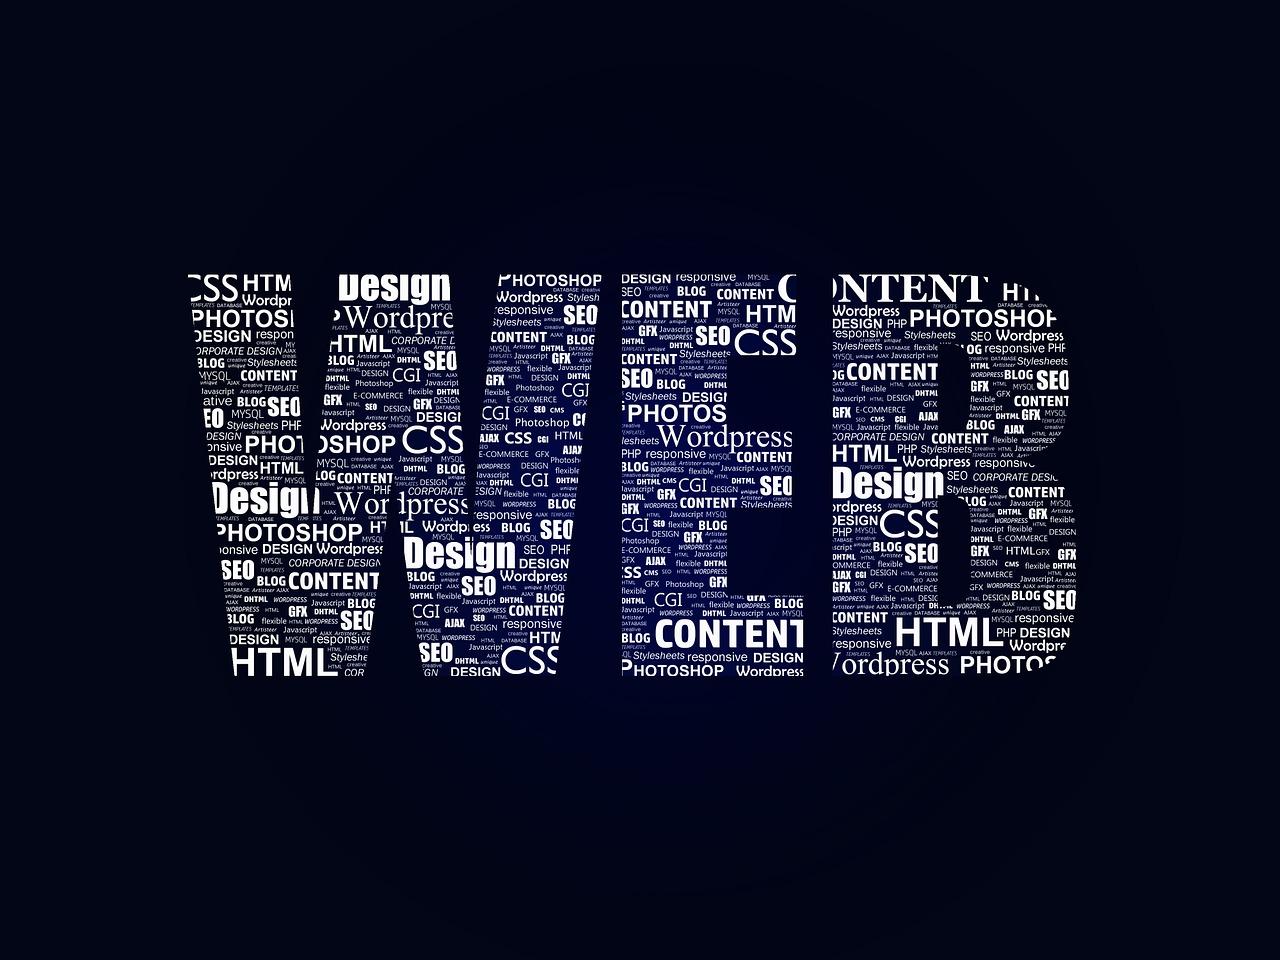 Brand Image WEB